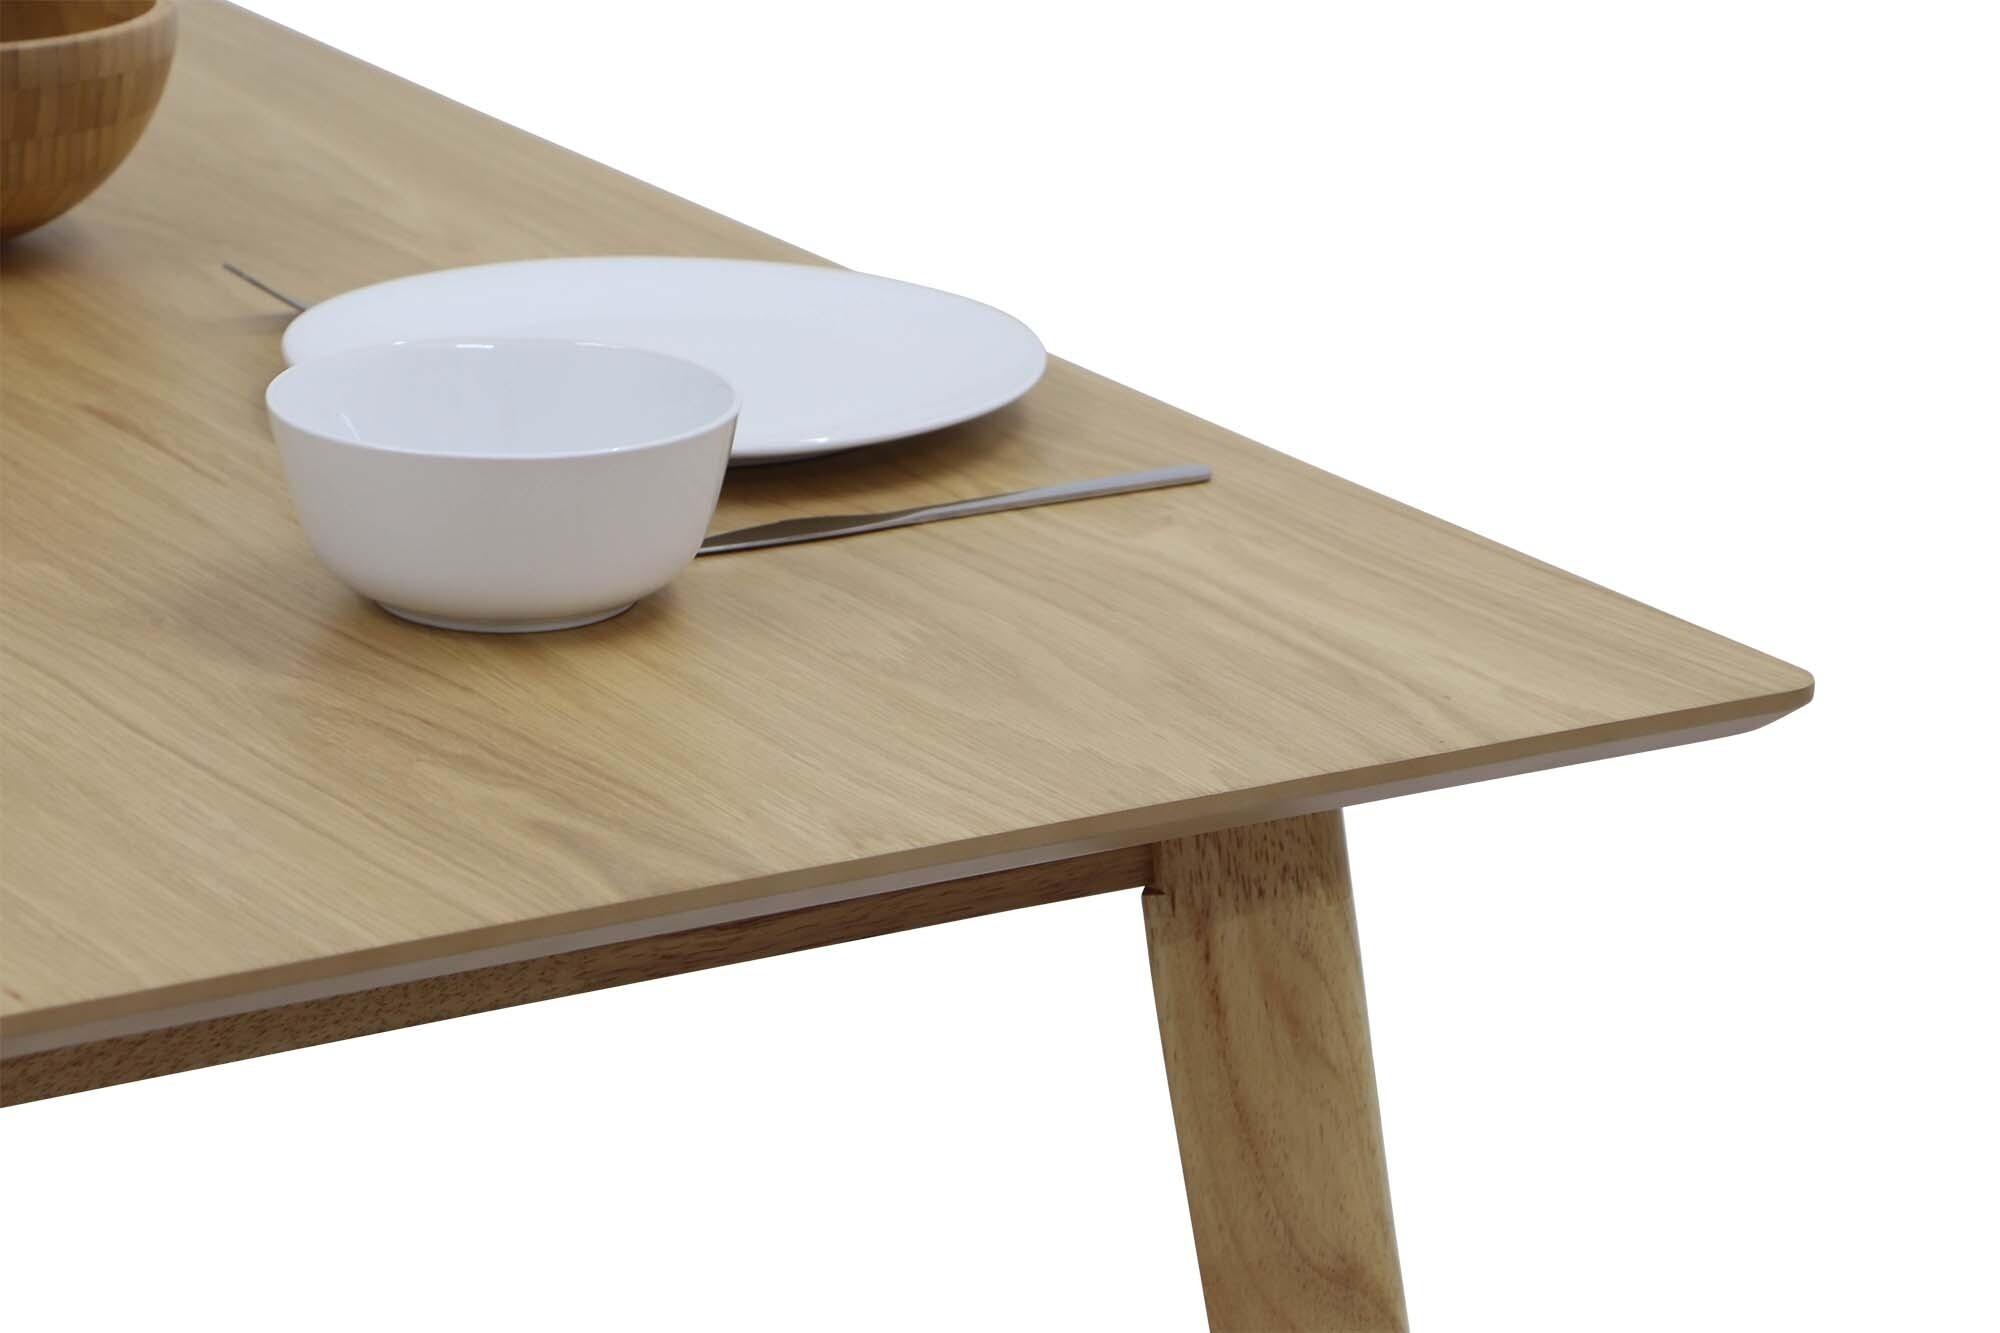 Ross dining table large oak regular price s399 00